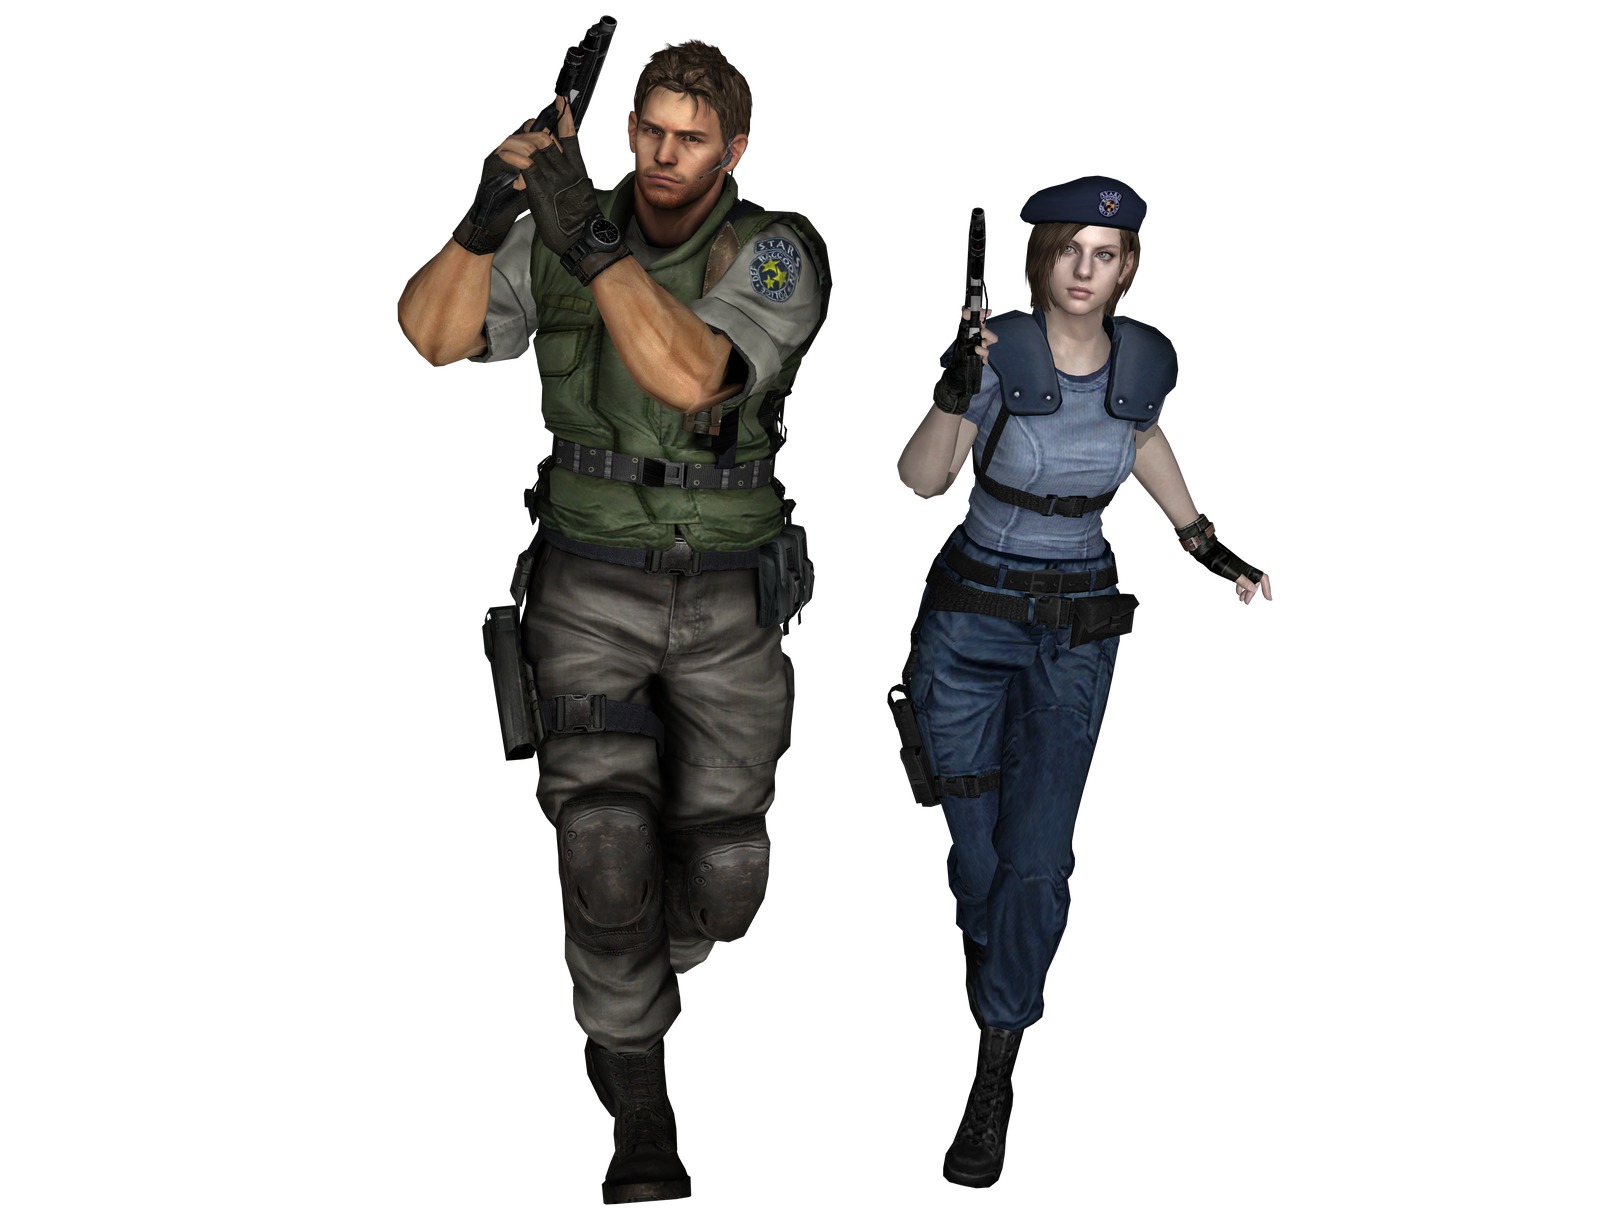 Chris and Jill by neromatherson